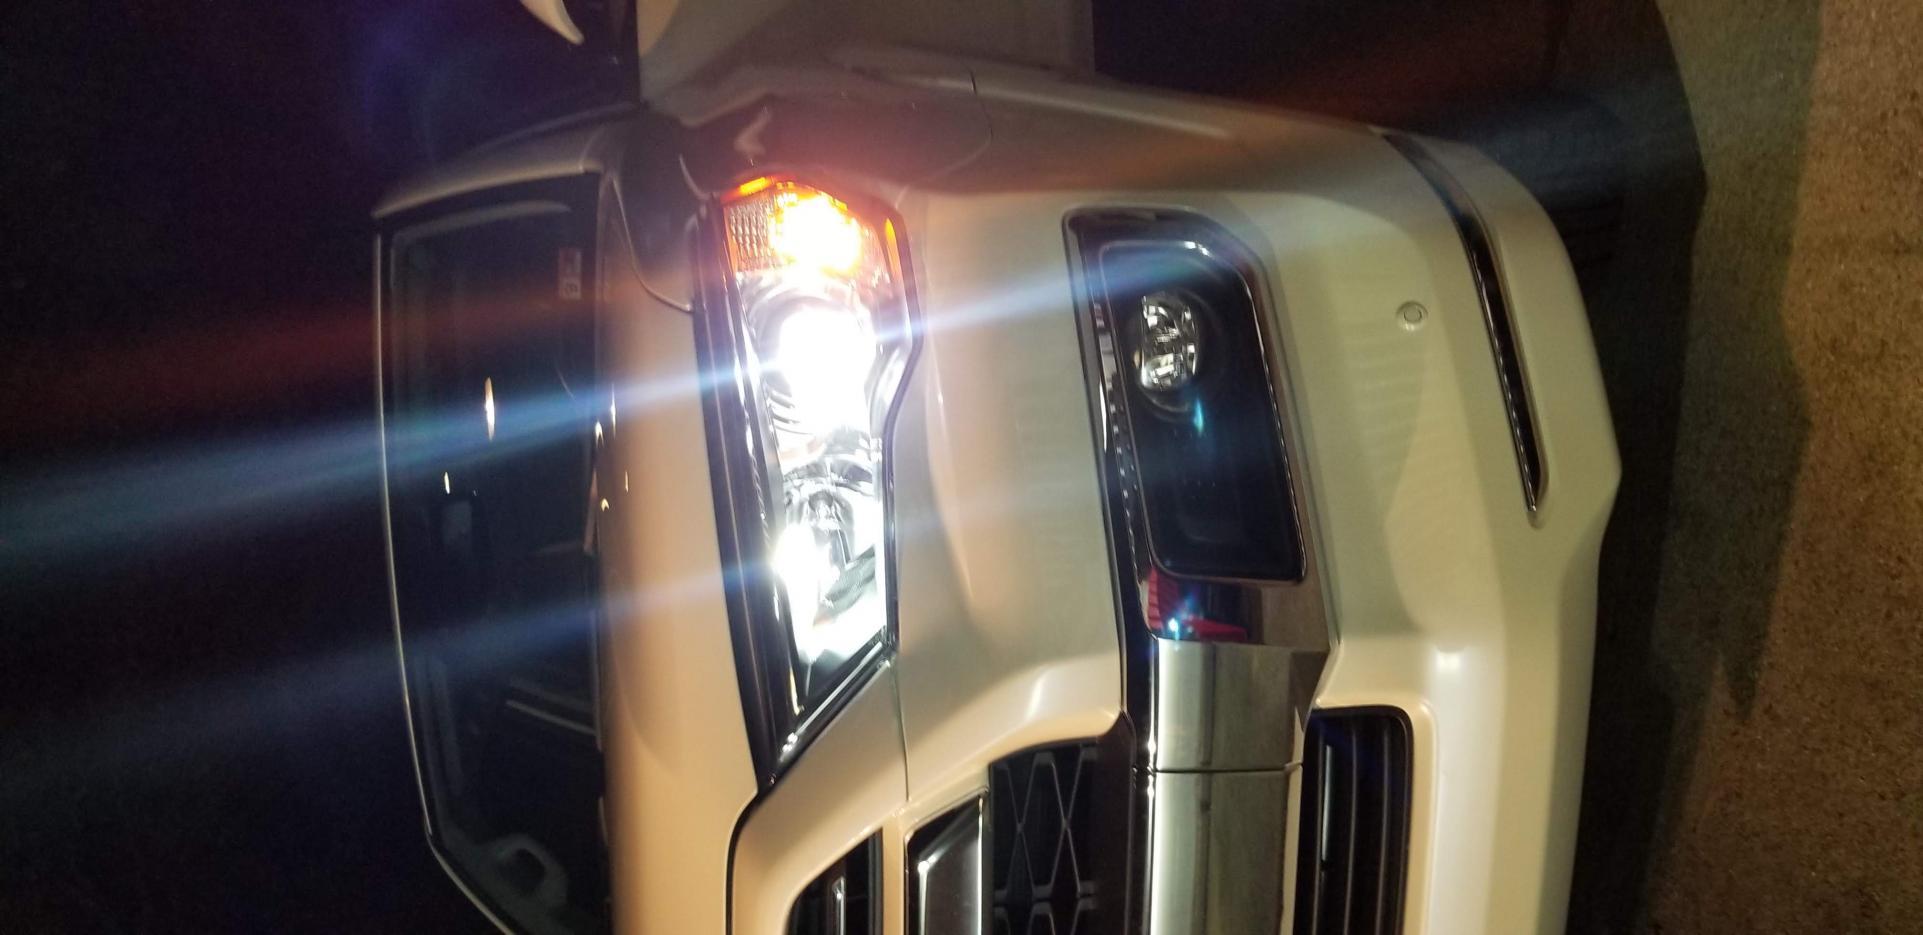 2021 4Runner OEM LED Headlights/Lights Performance and Retrofit-20201014_191757-jpg